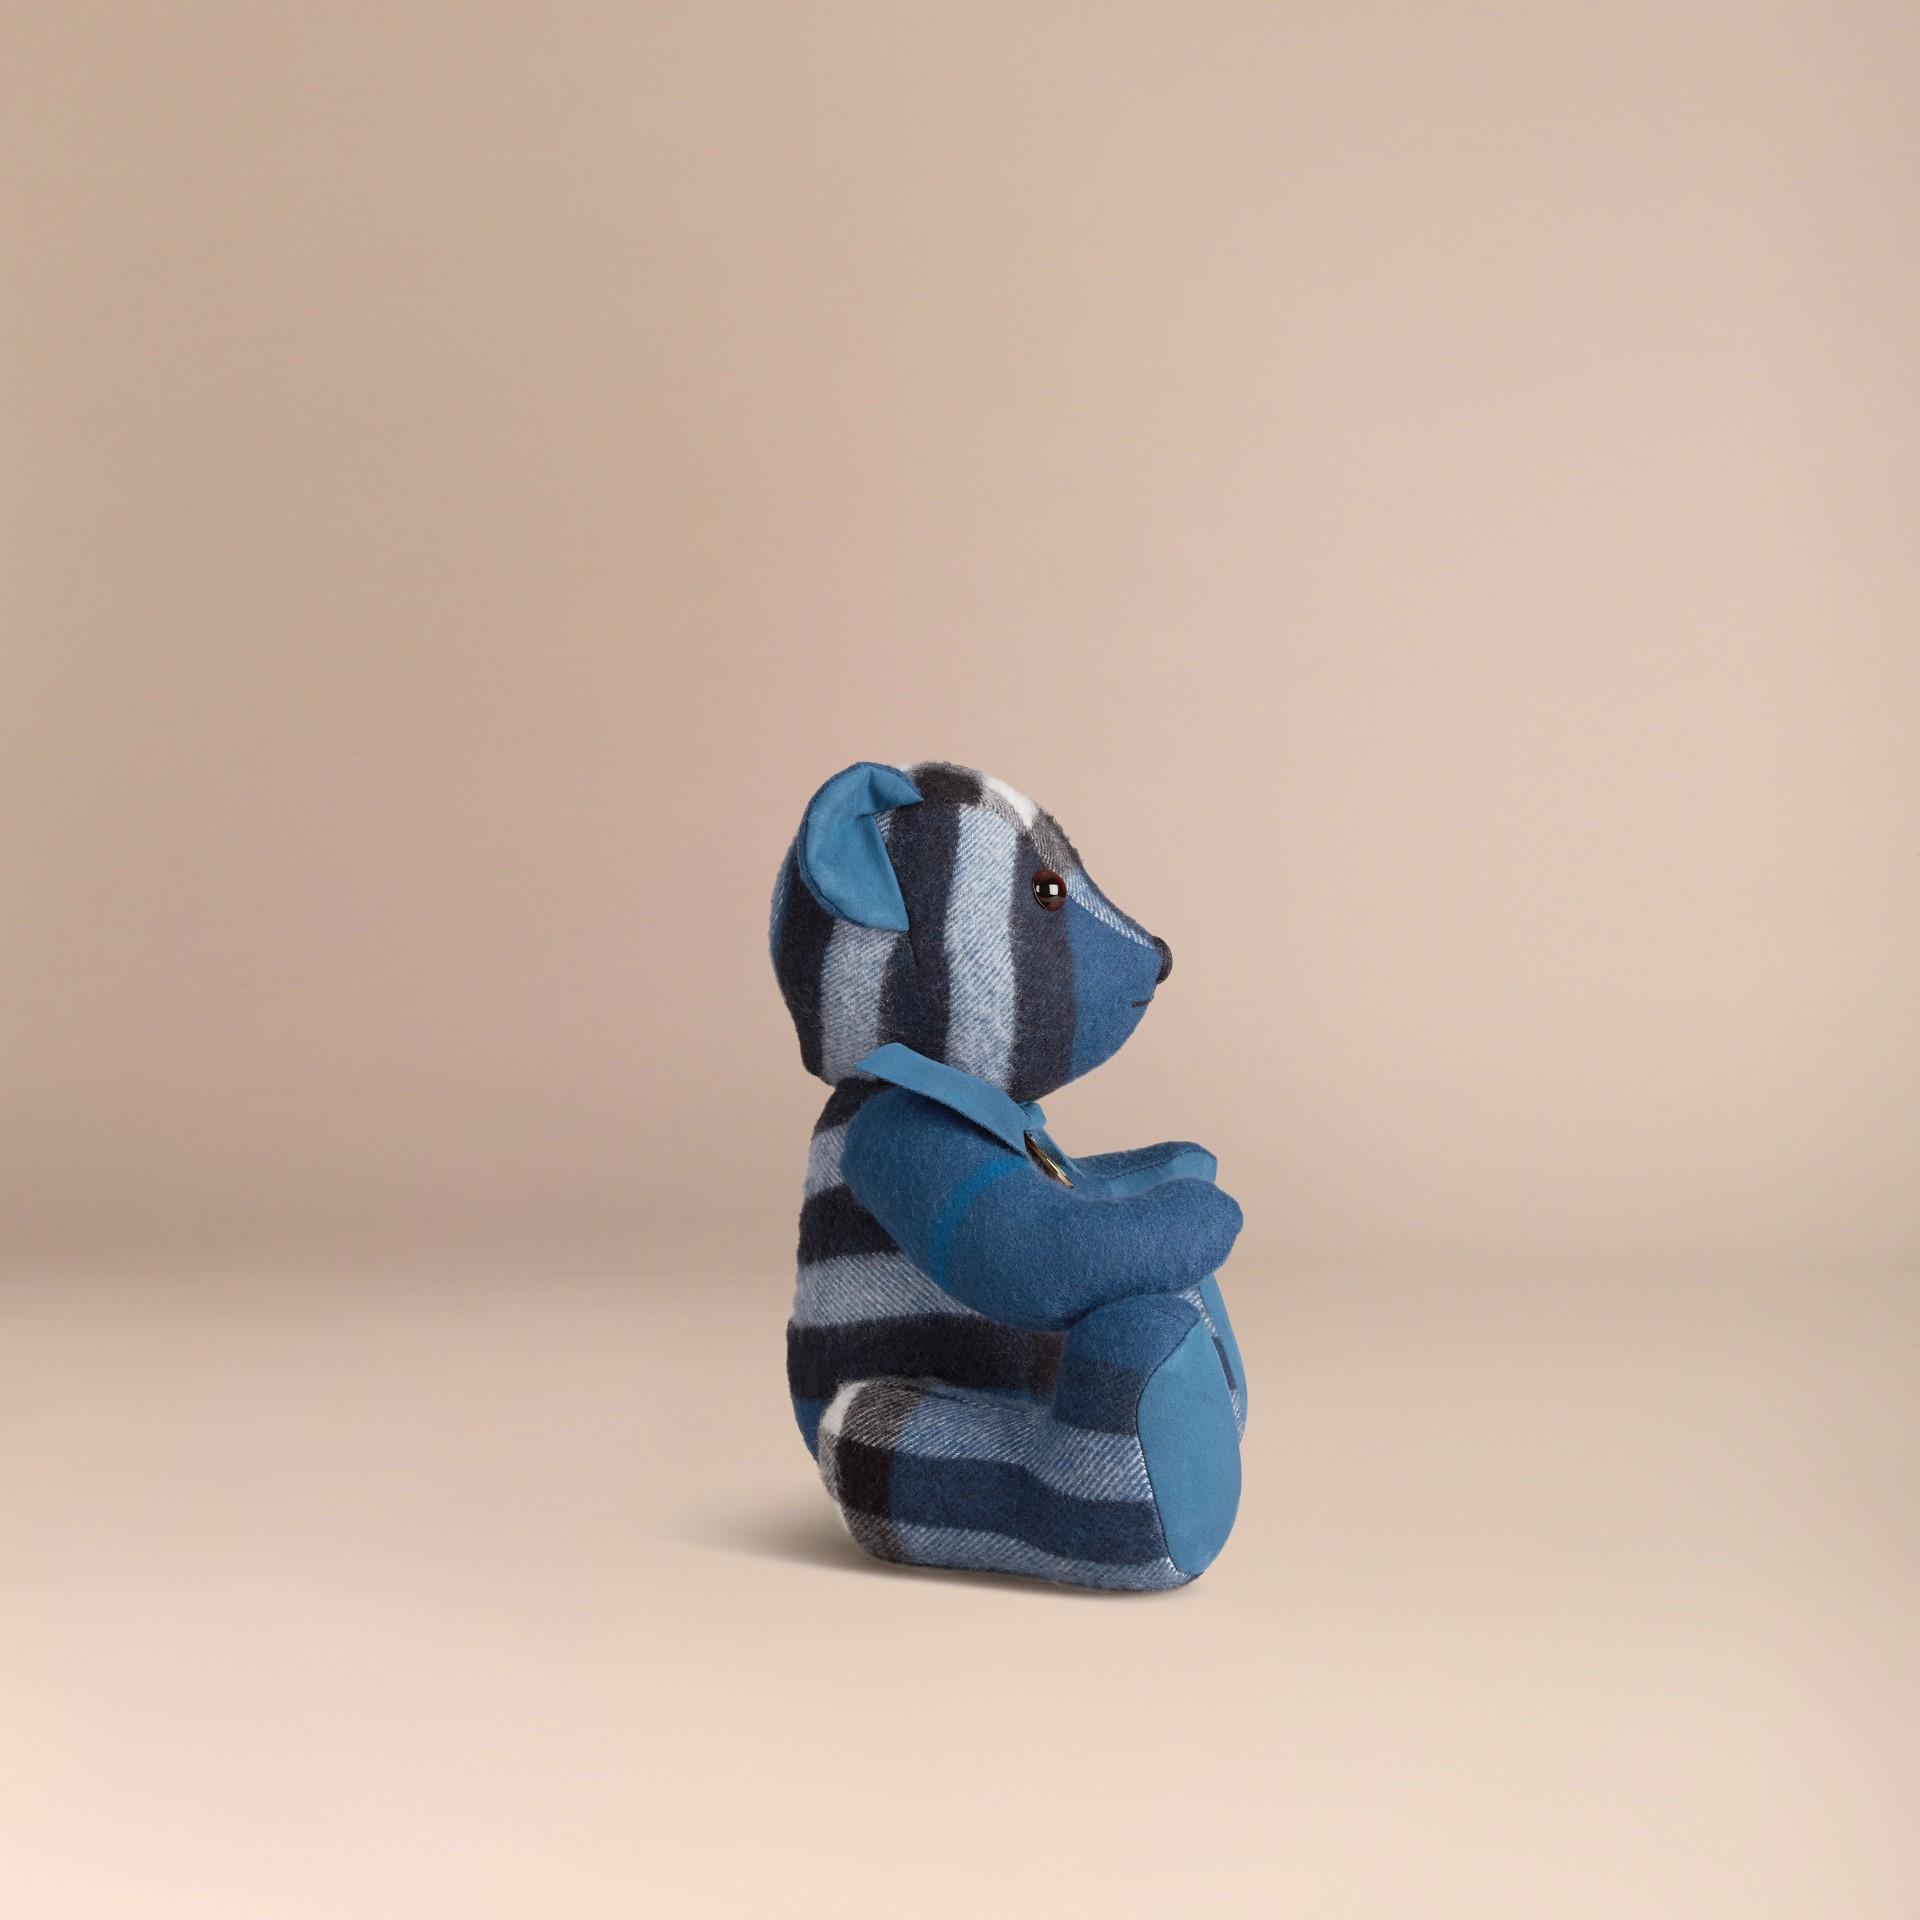 Ozeanblau Burberry-Teddybär aus Kaschmir mit Check-Muster Ozeanblau - Galerie-Bild 3